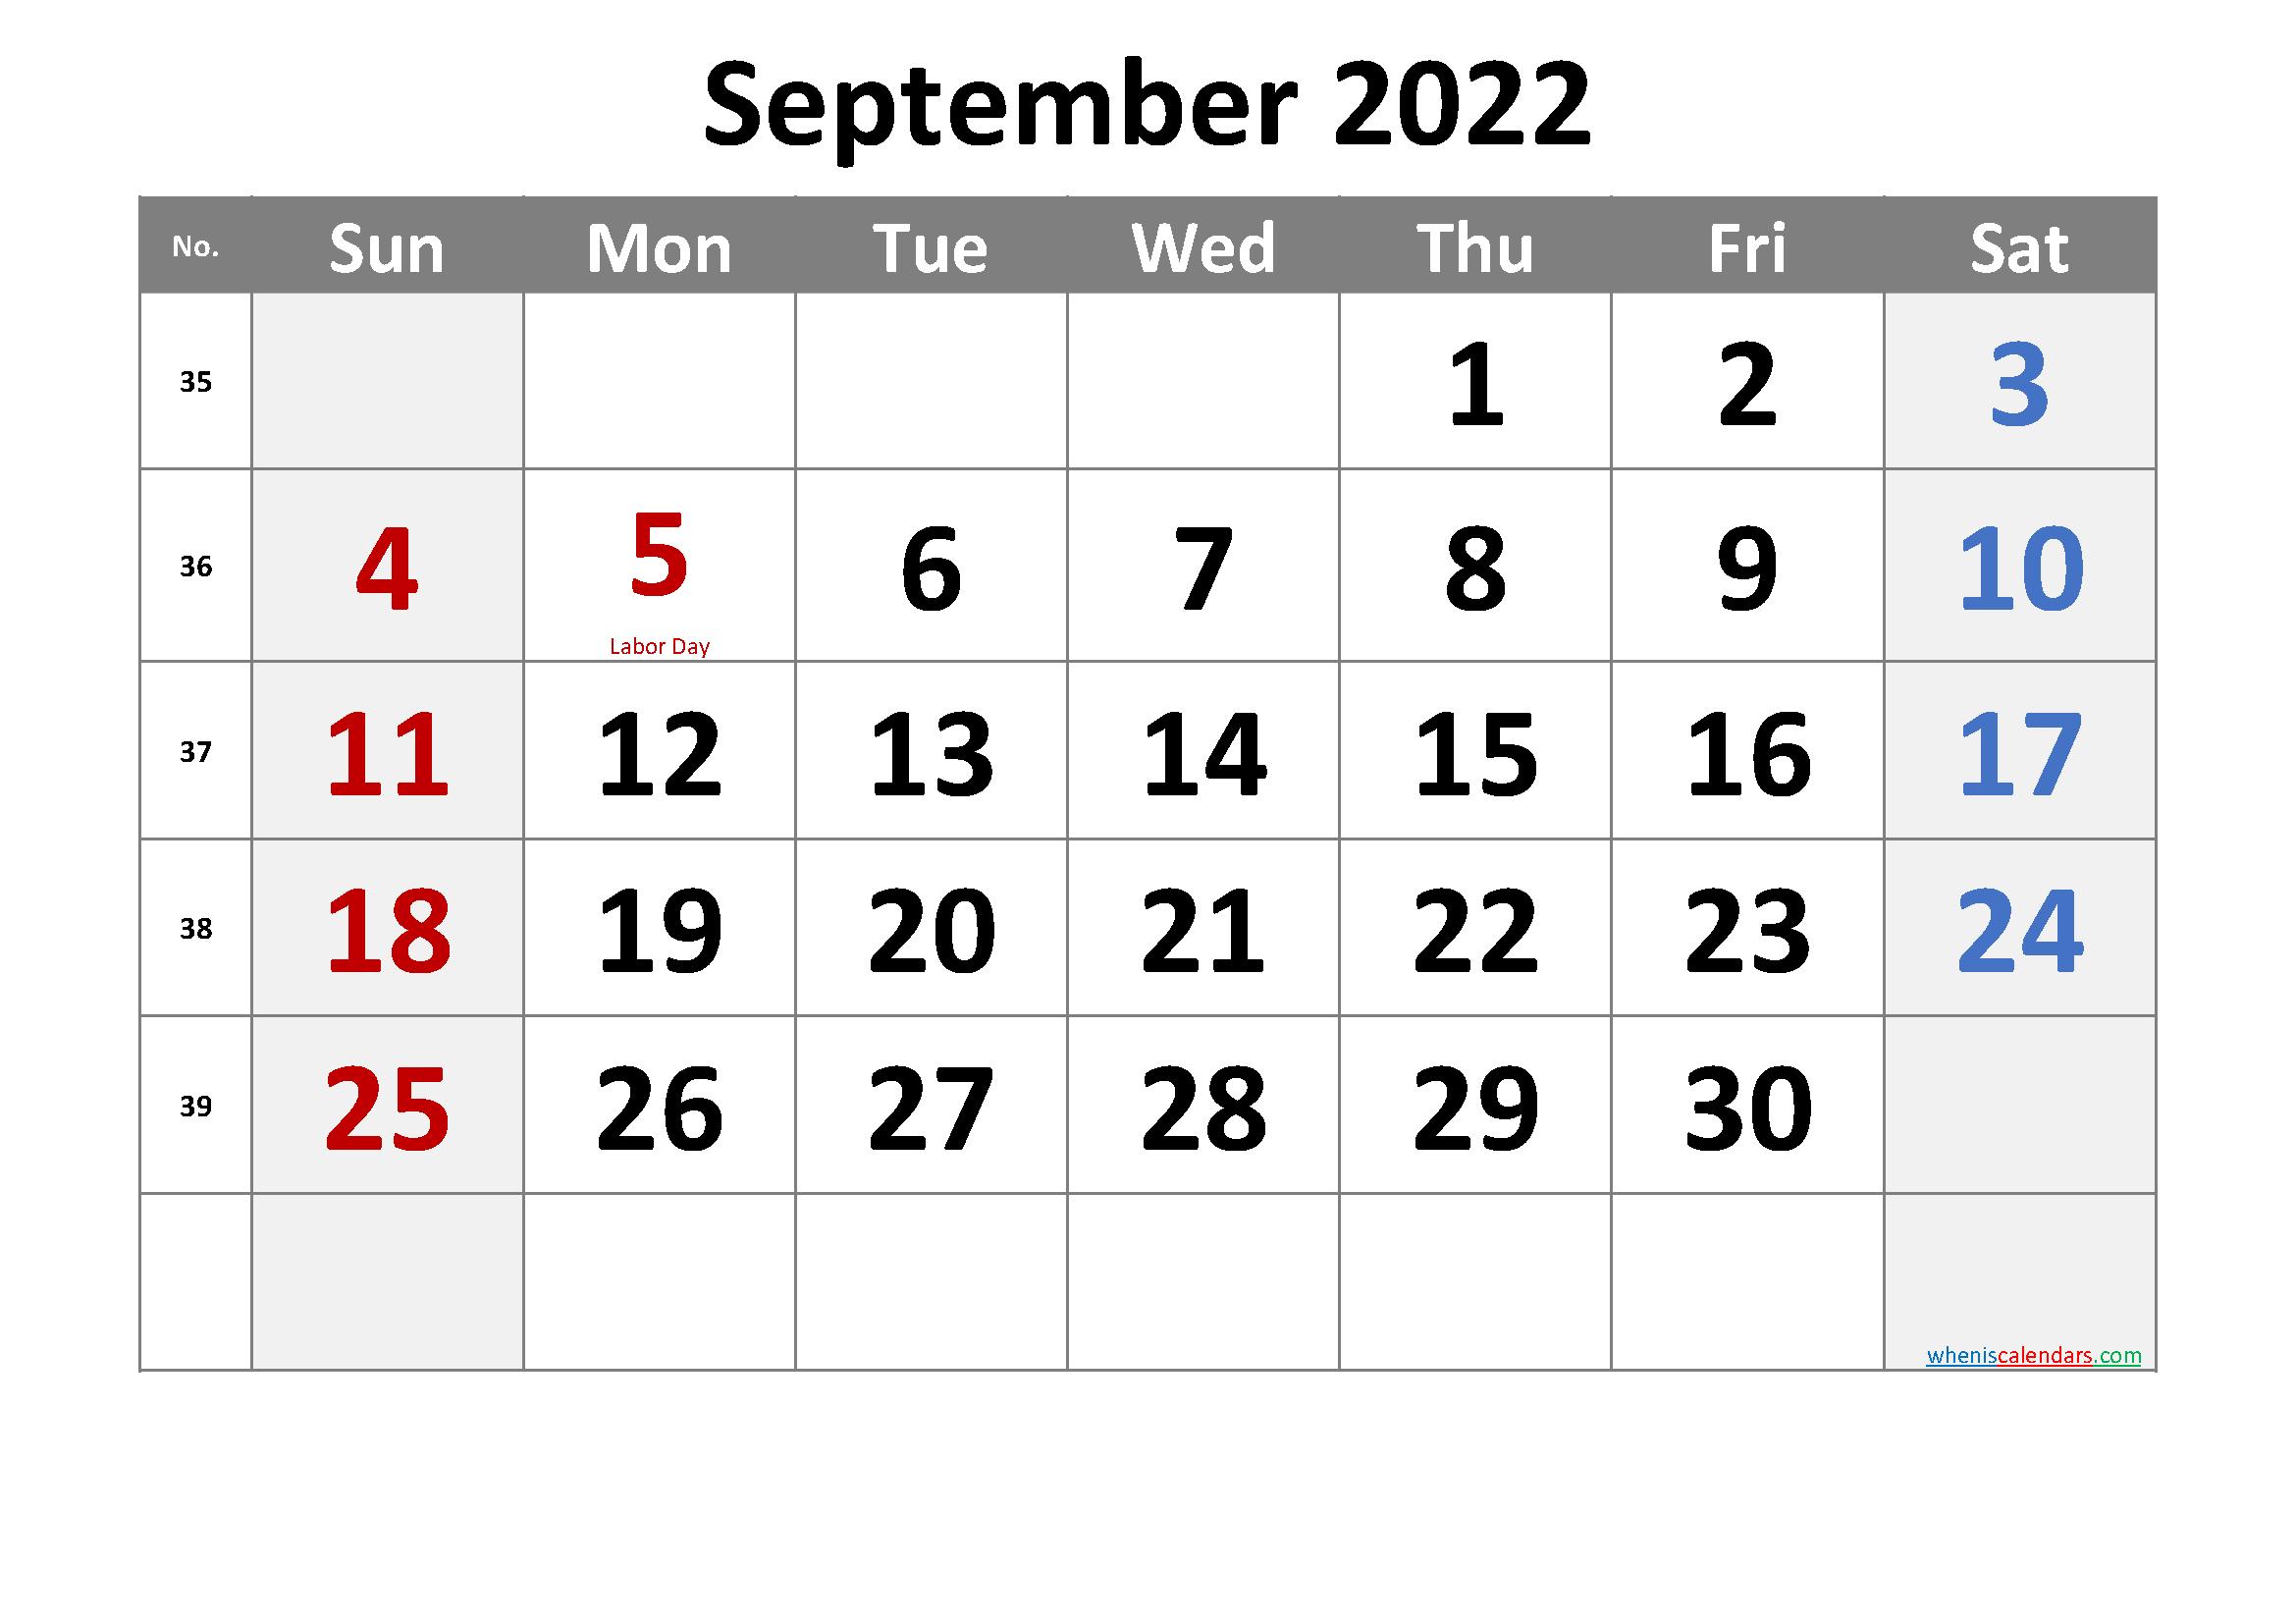 SEPTEMBER 2022 Printable Calendar with Holidays